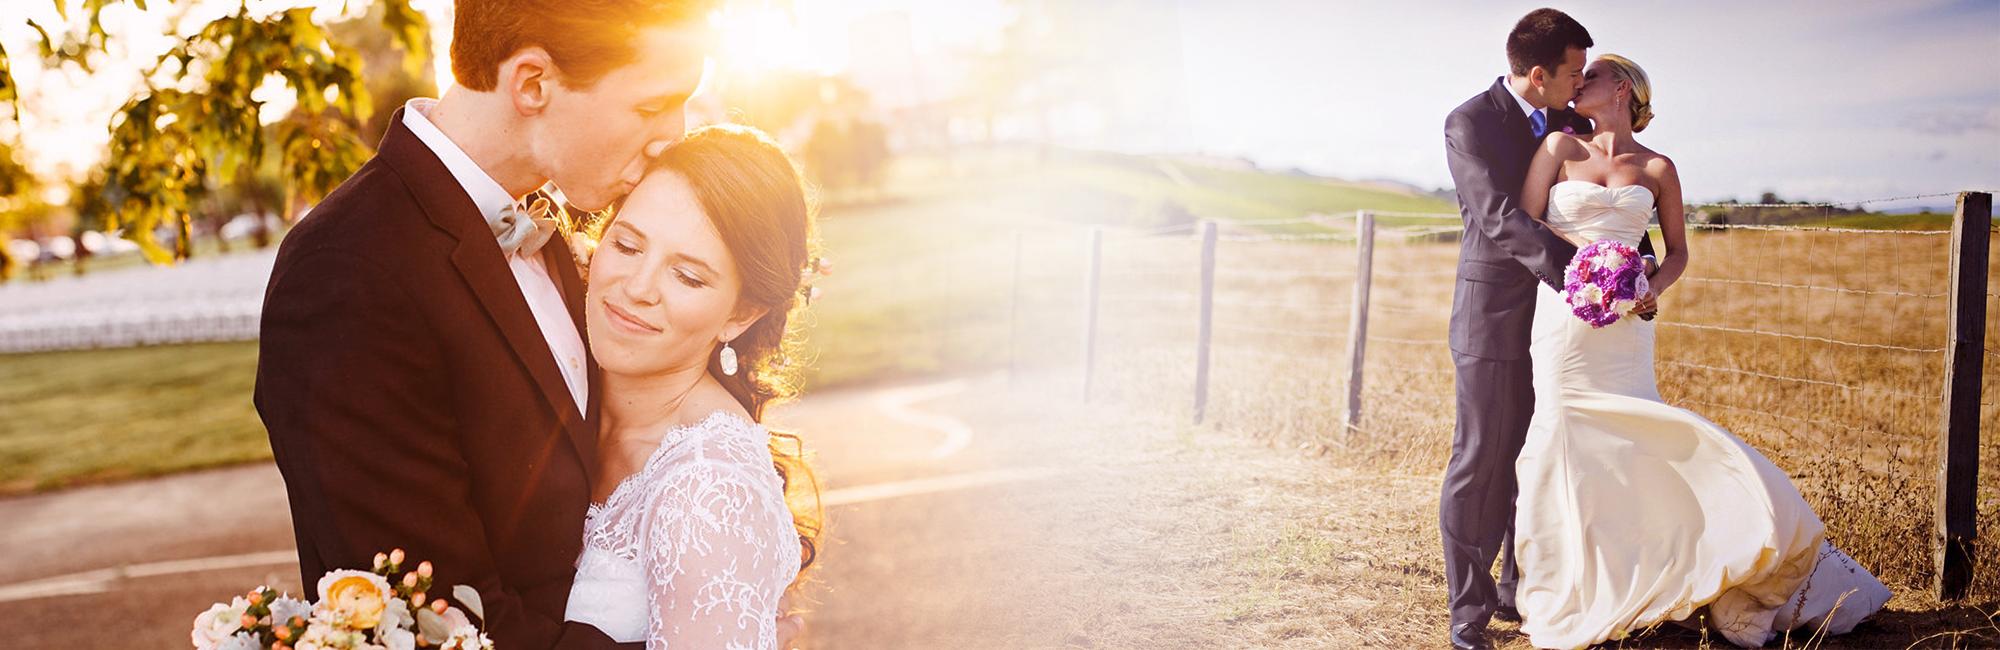 fotografo-matrimonio-vercelli-novara-borgosesia-varallo